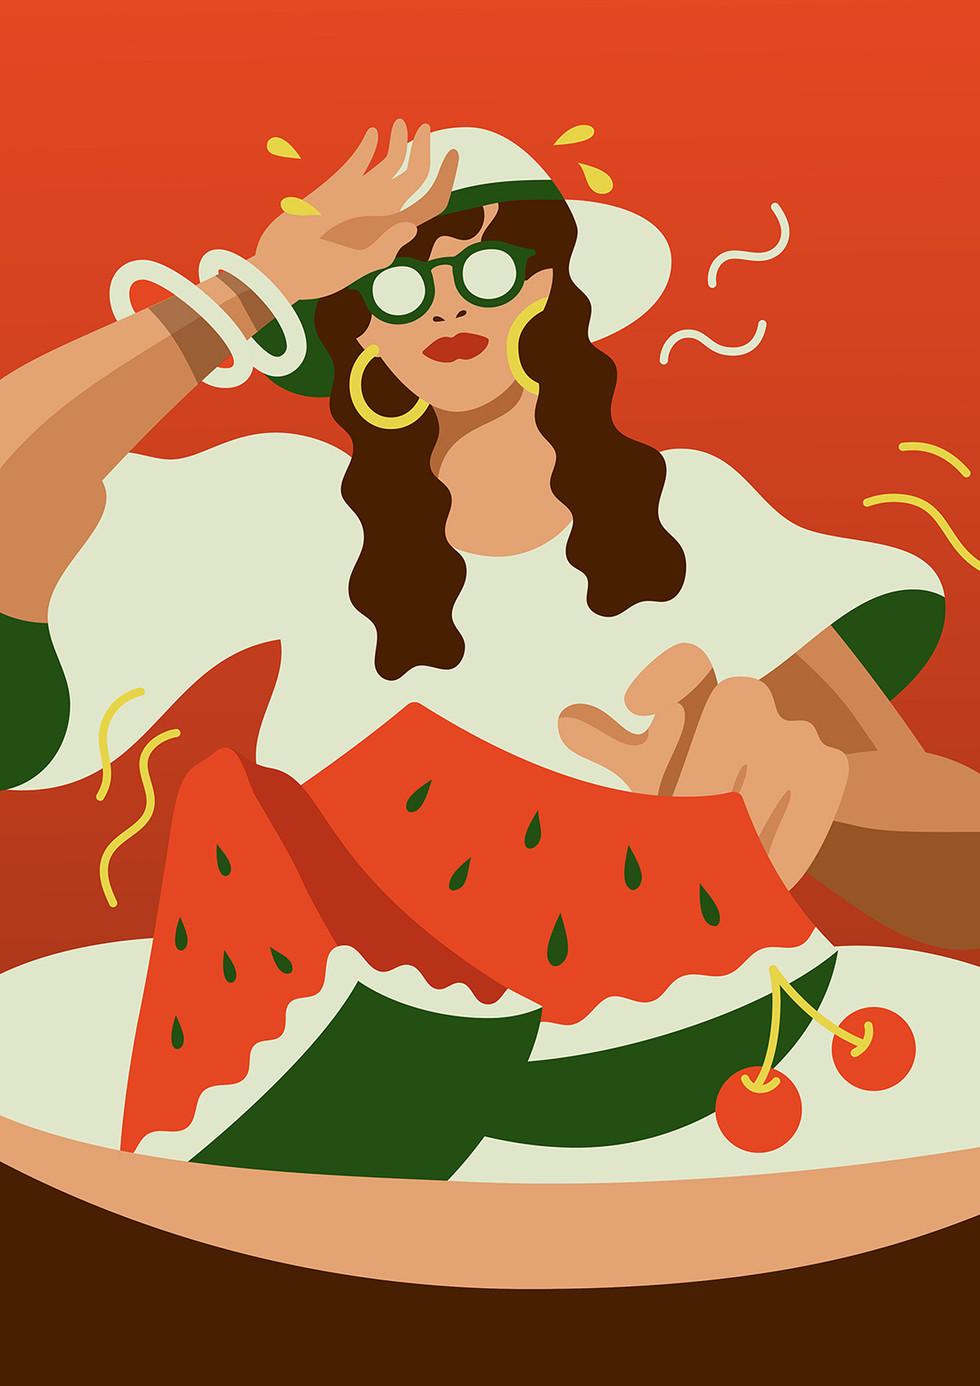 Personal Work Watermelon